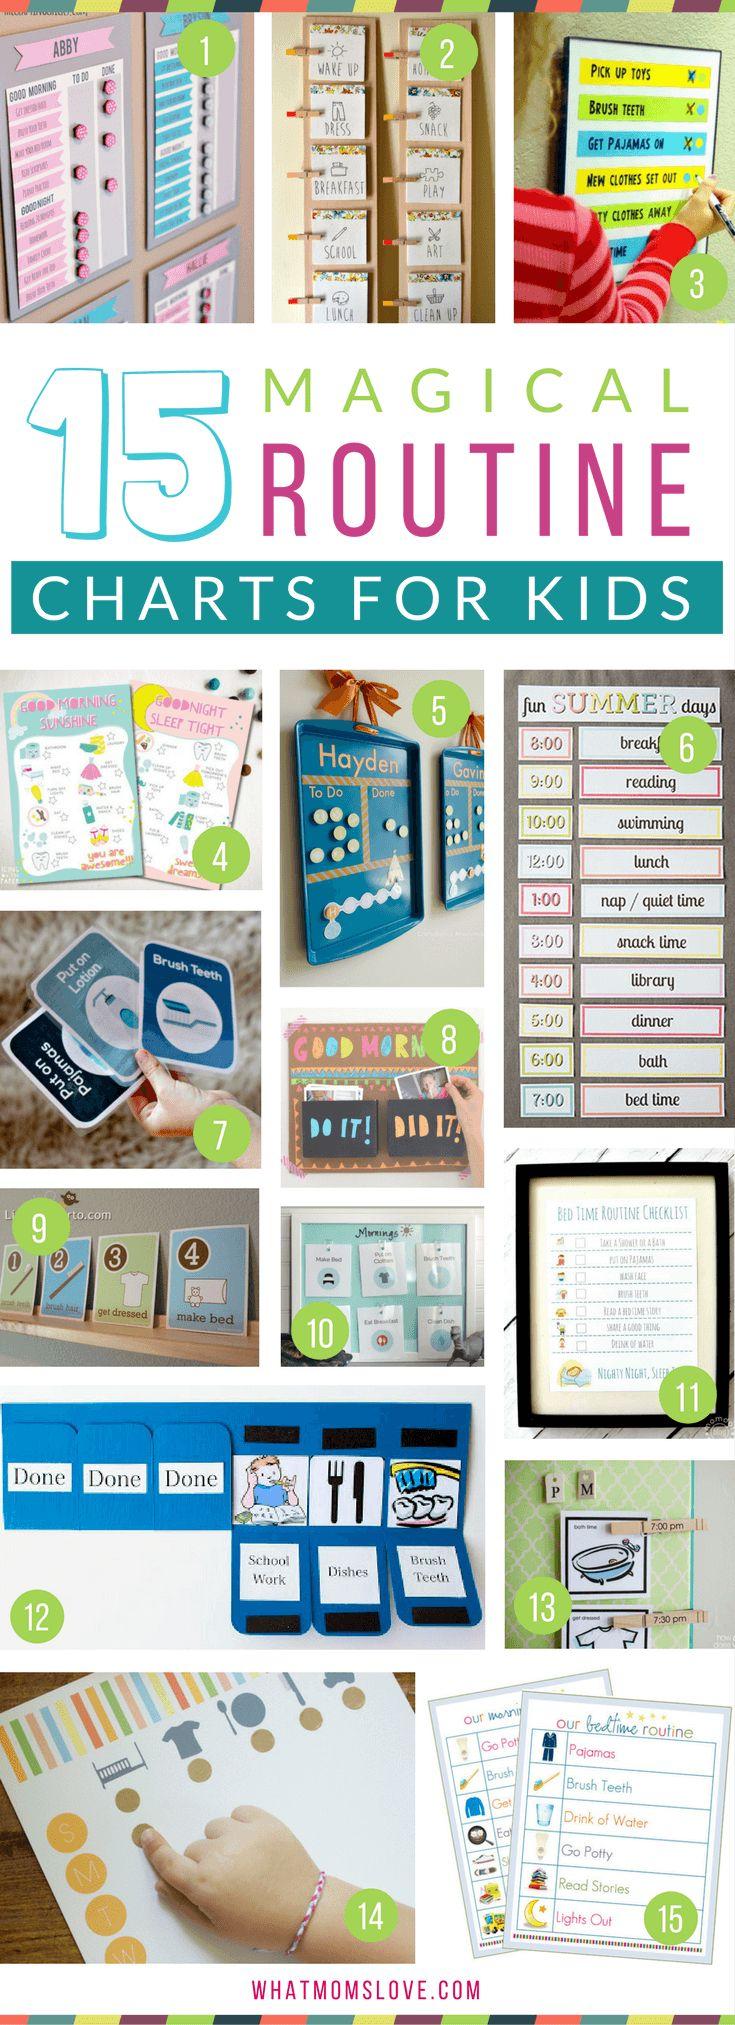 811 best Kids Spaces images on Pinterest   Parenting, Child ...